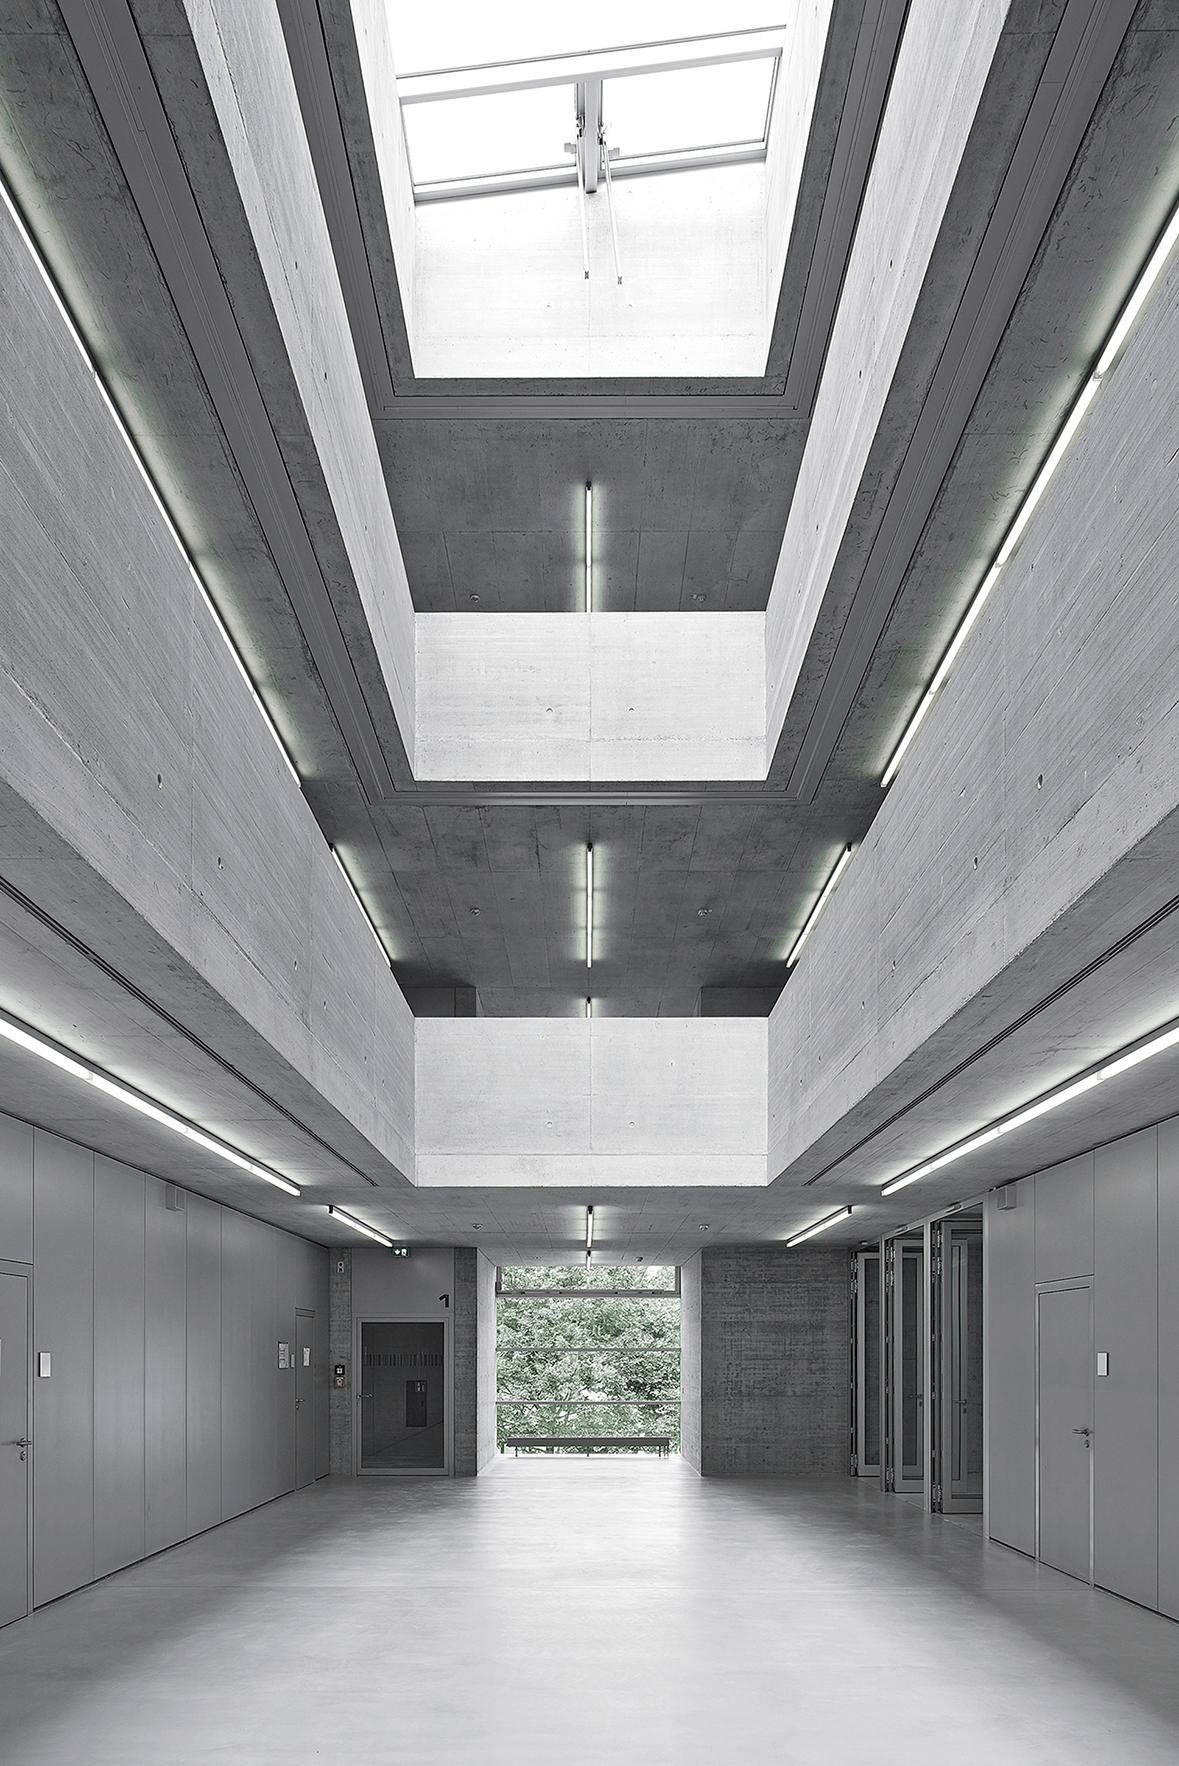 Architects Stuttgart stuttgart tag archdaily